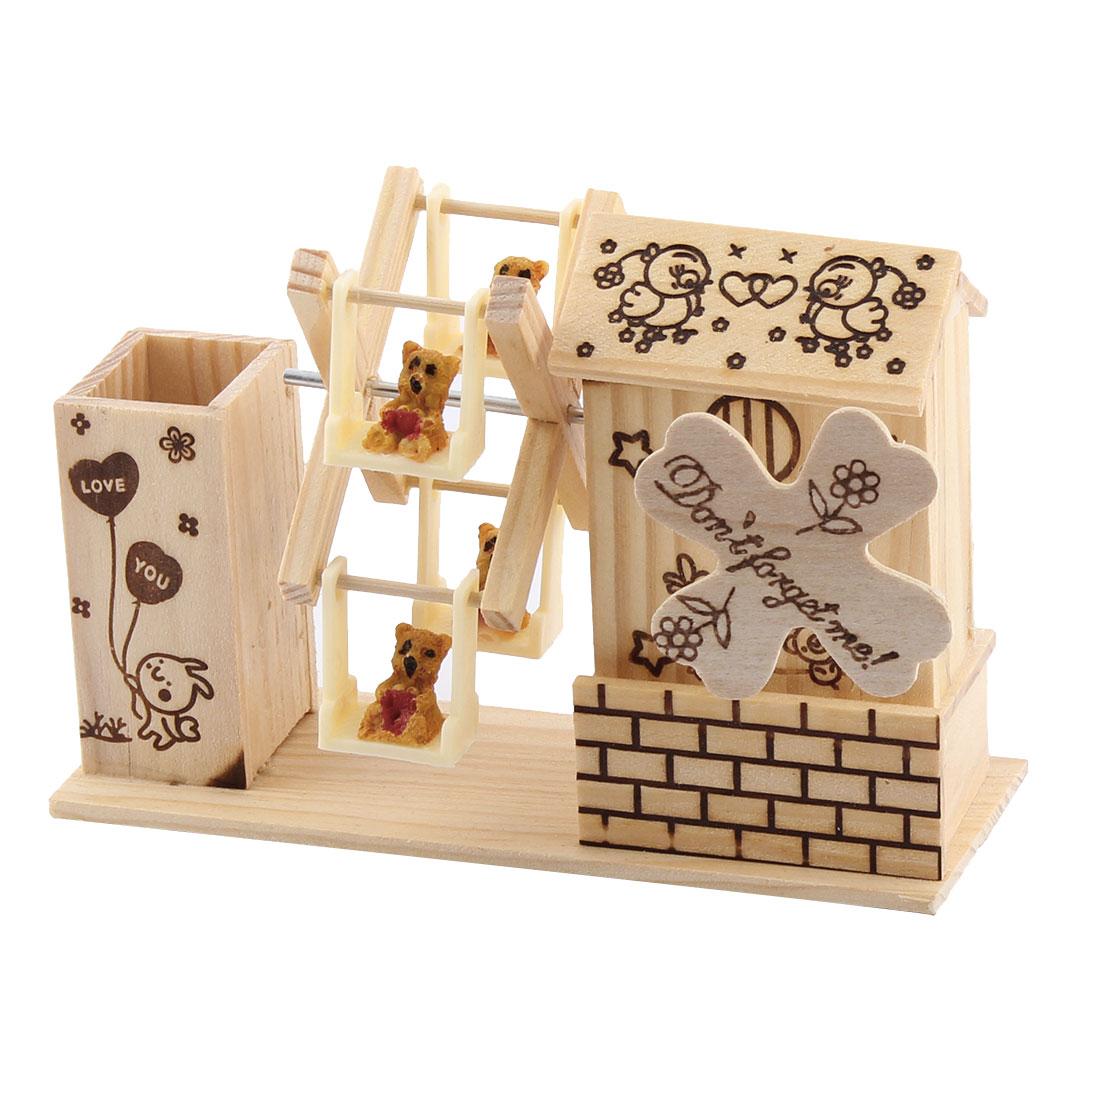 Wood Carton Print Four Bears Decor Windmill Shaped Dual-use Pencil Holder Music Box